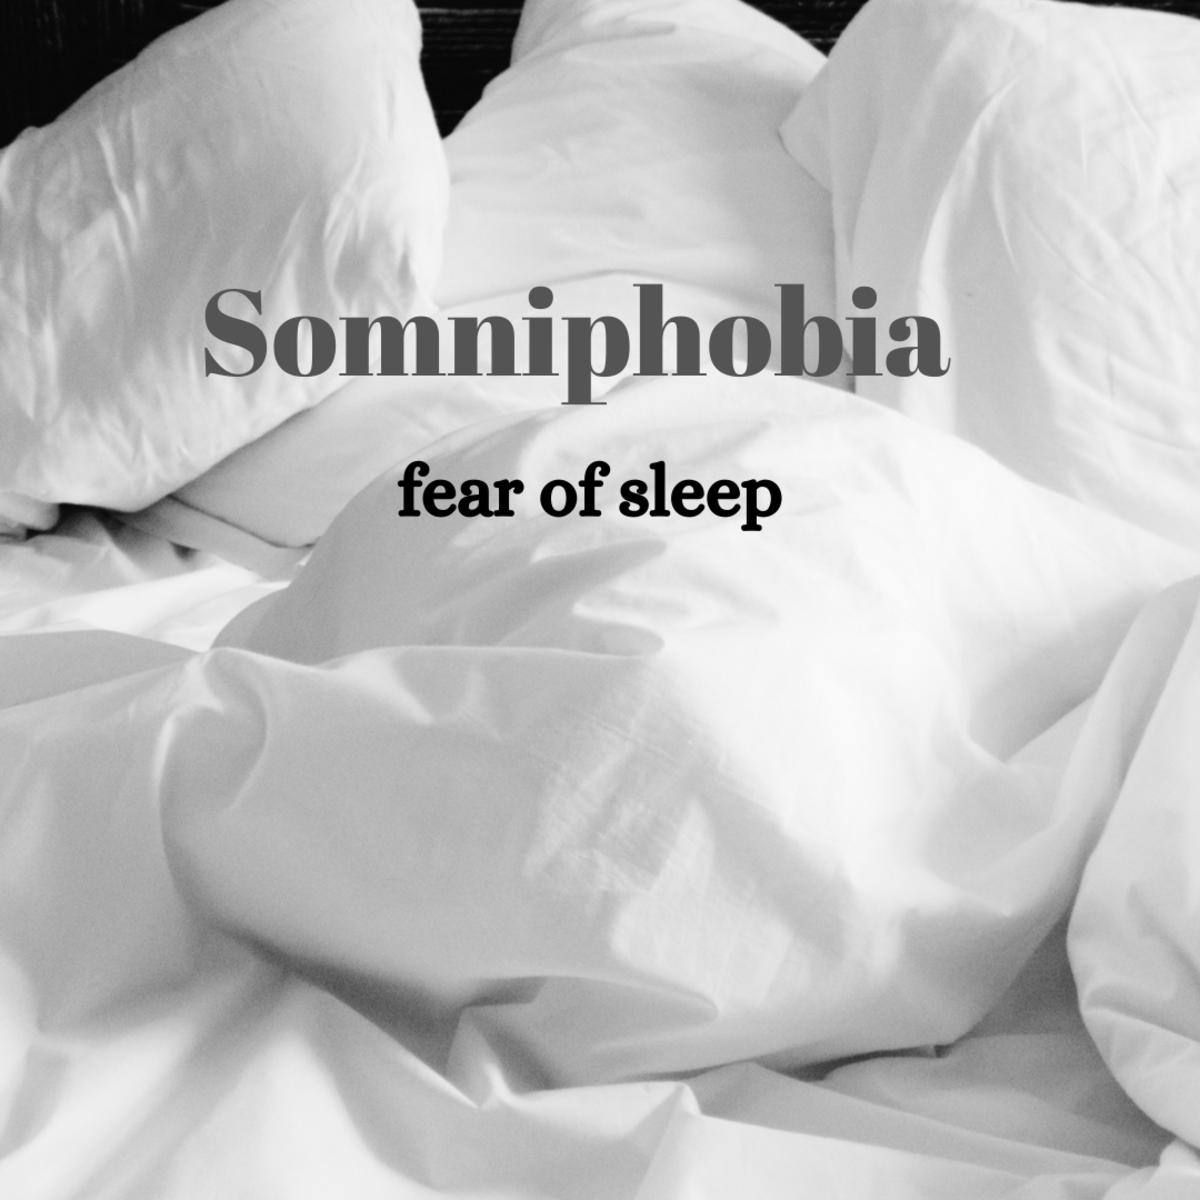 Somniphobia, a fear of sleep